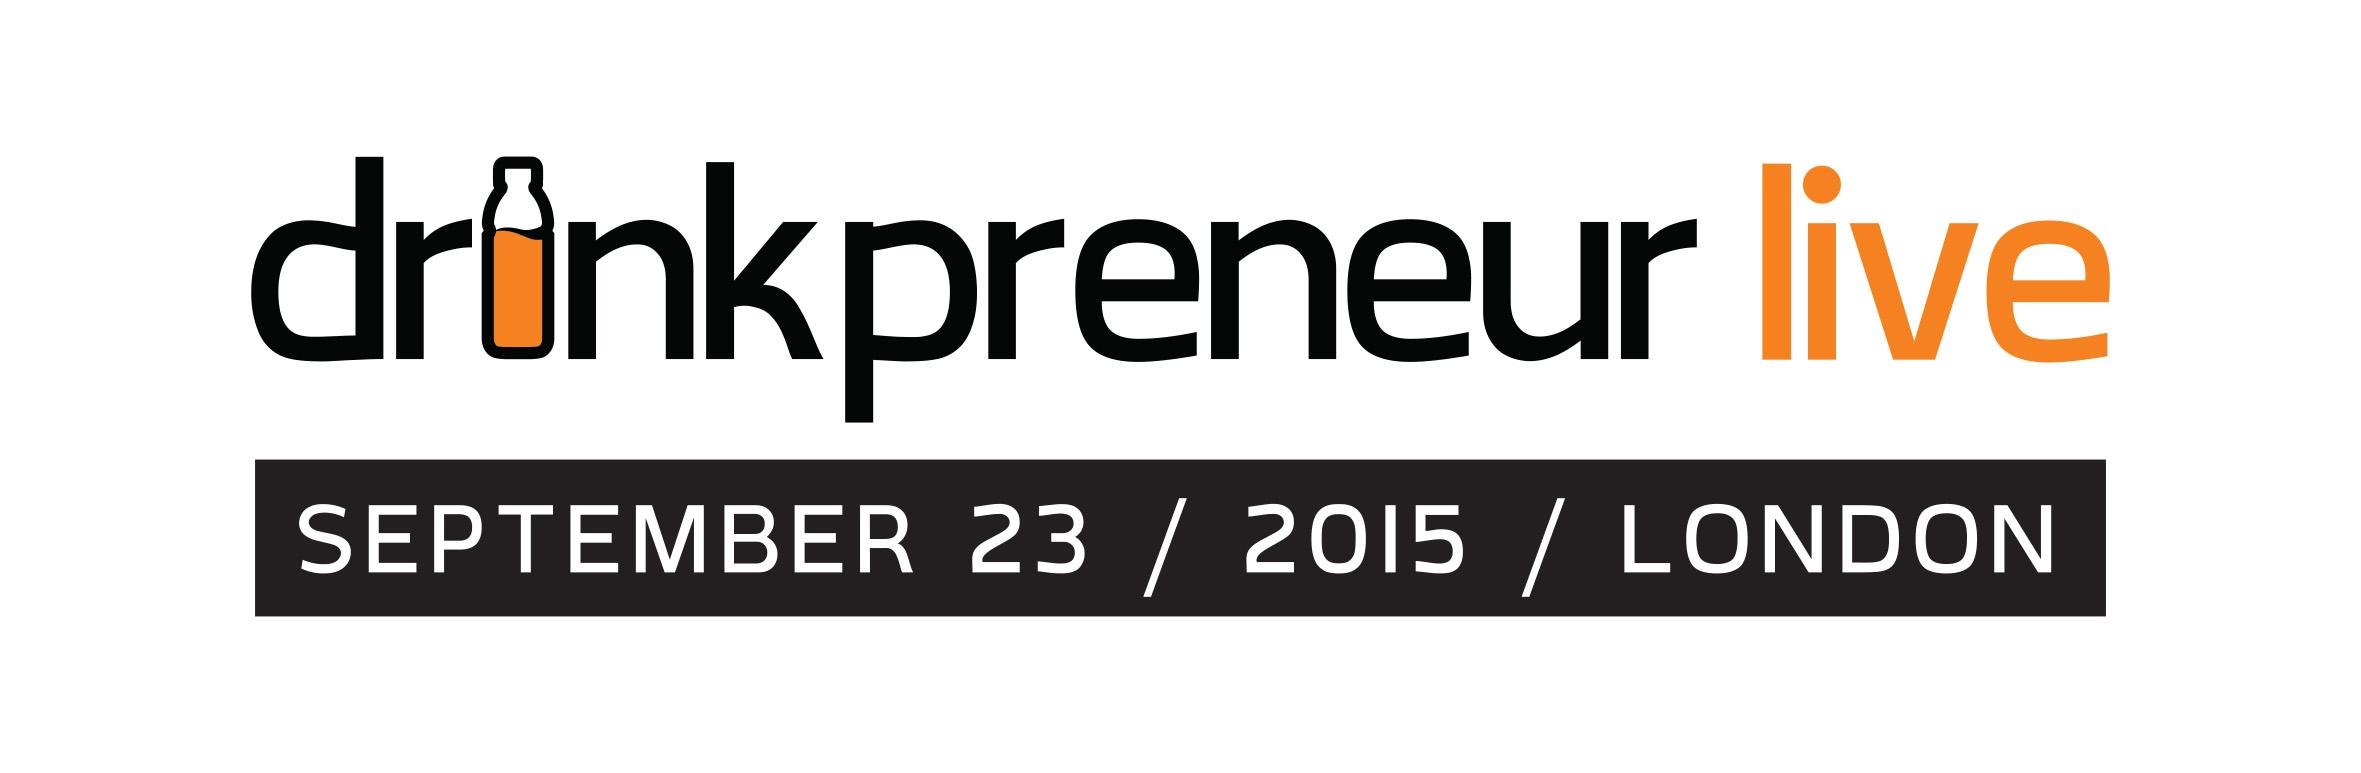 drinkpreneur live 2015